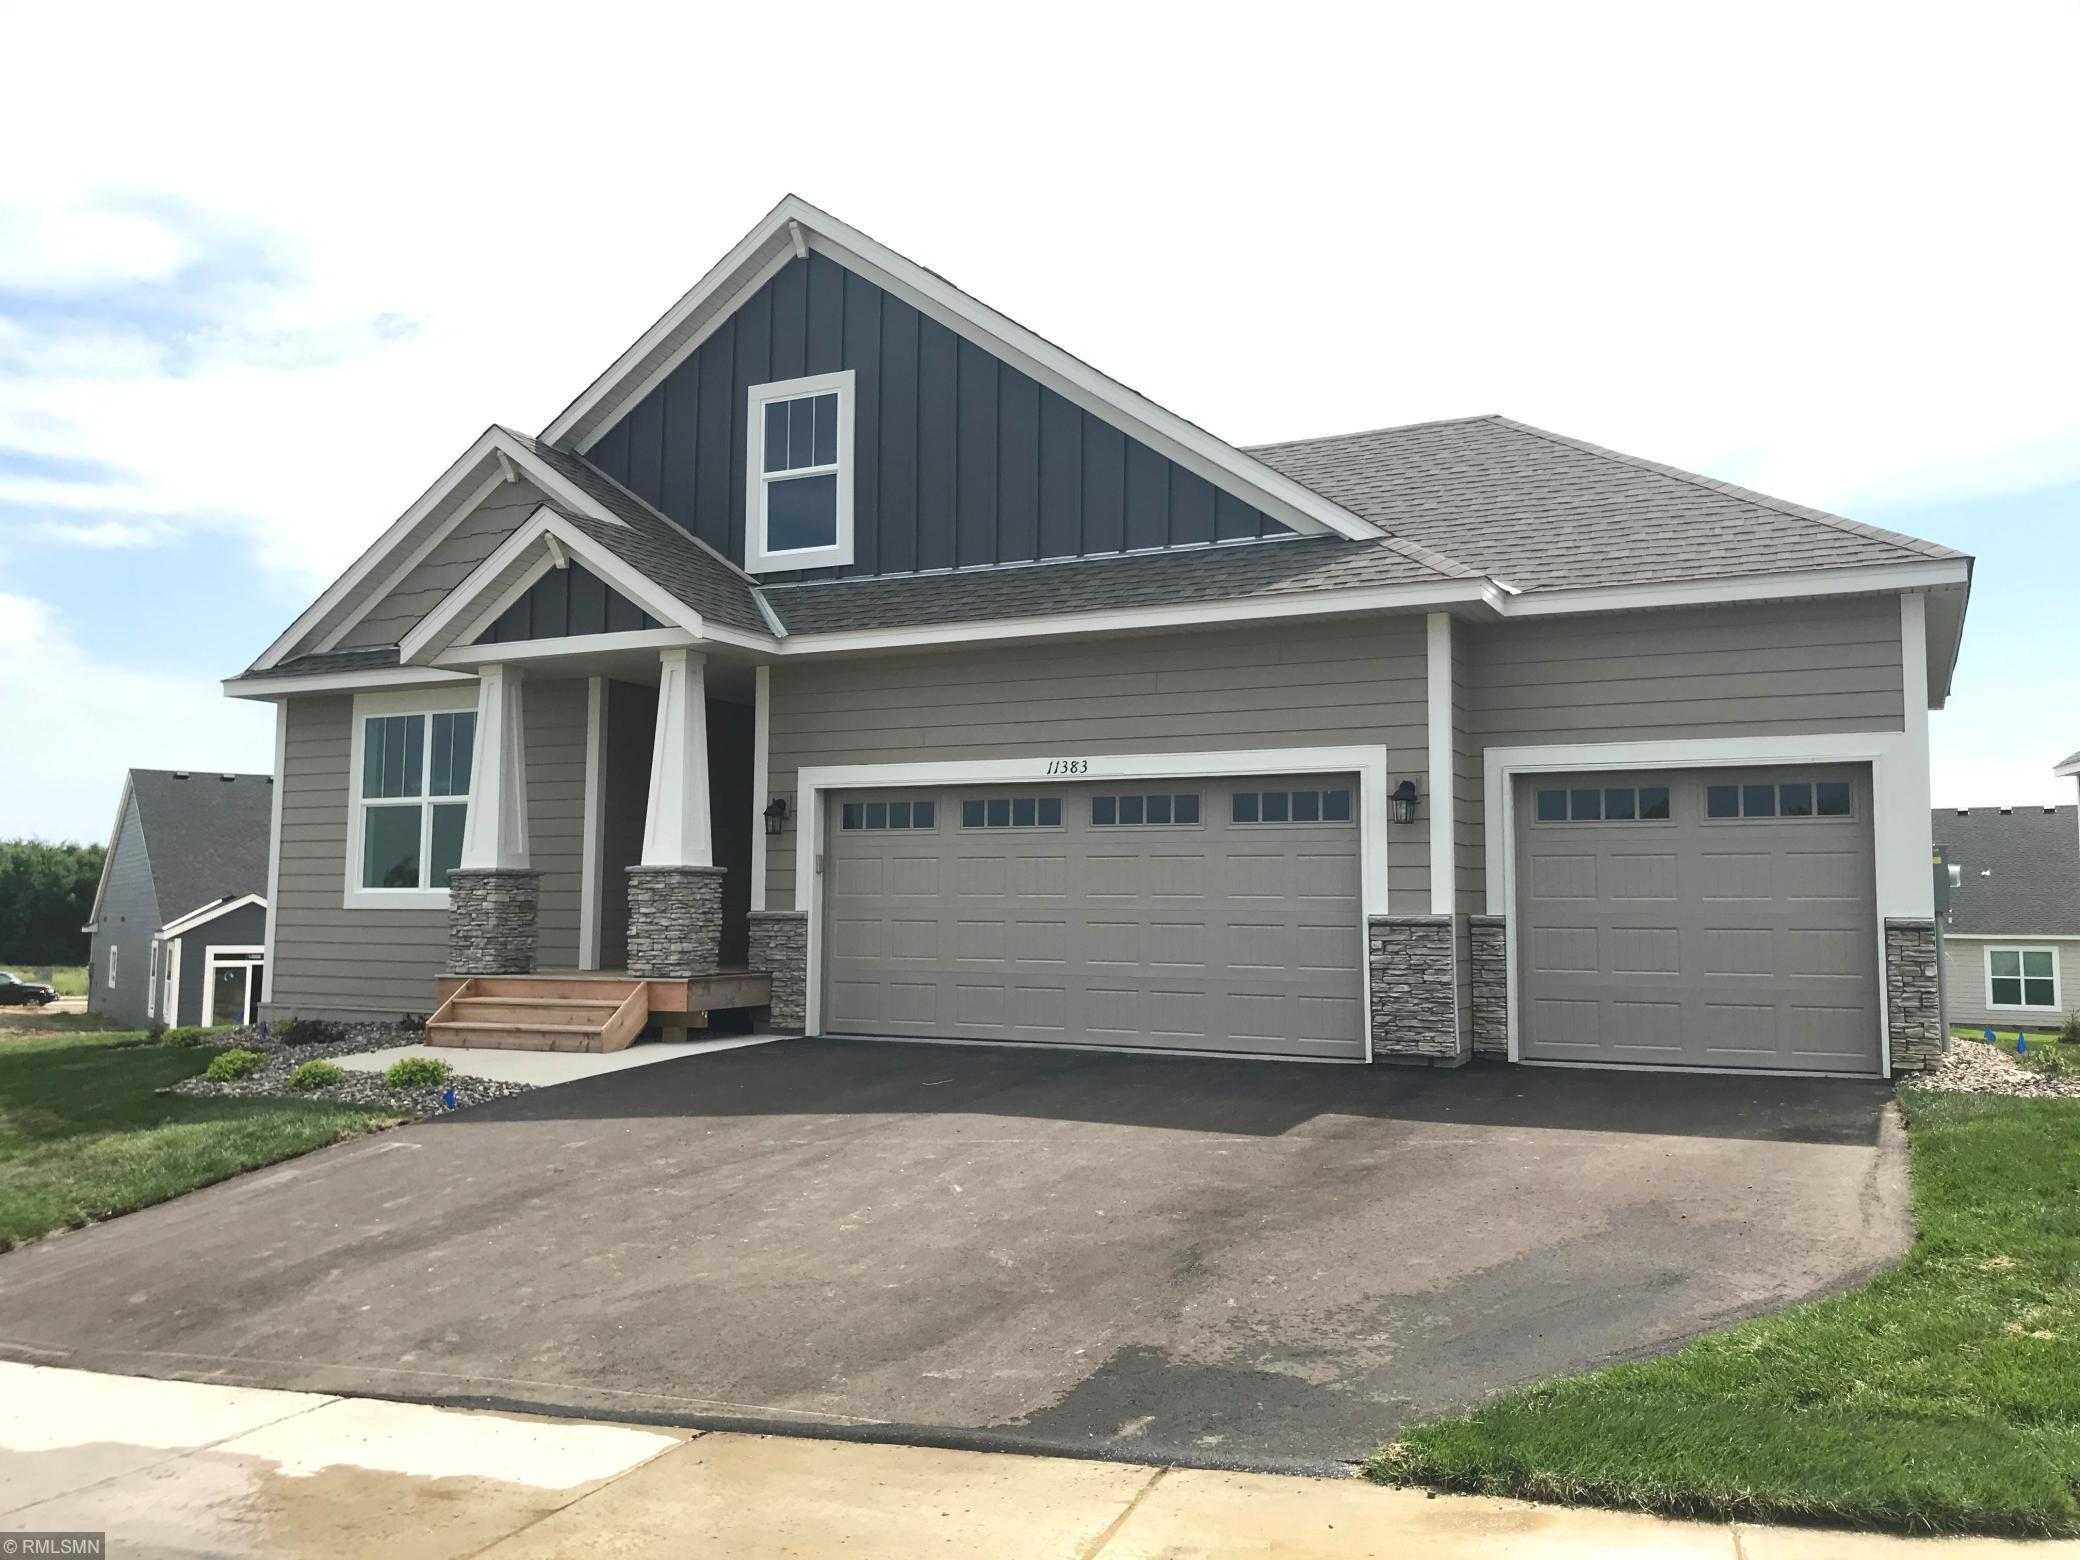 11383 Lancaster Way NE Property Photo - Albertville, MN real estate listing